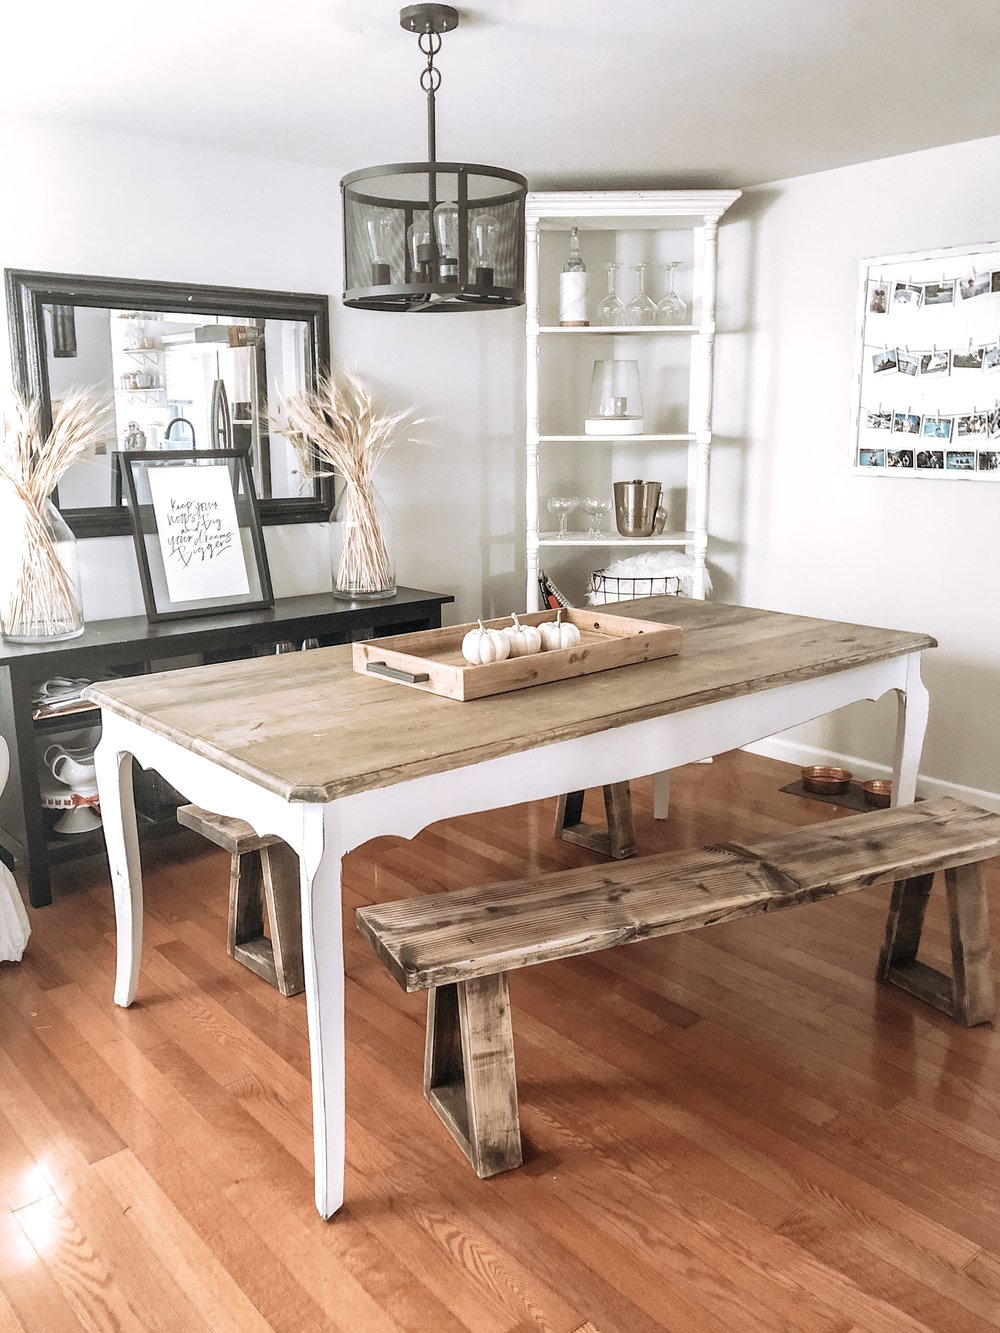 DIY Coastal Farmhouse Dining Bench